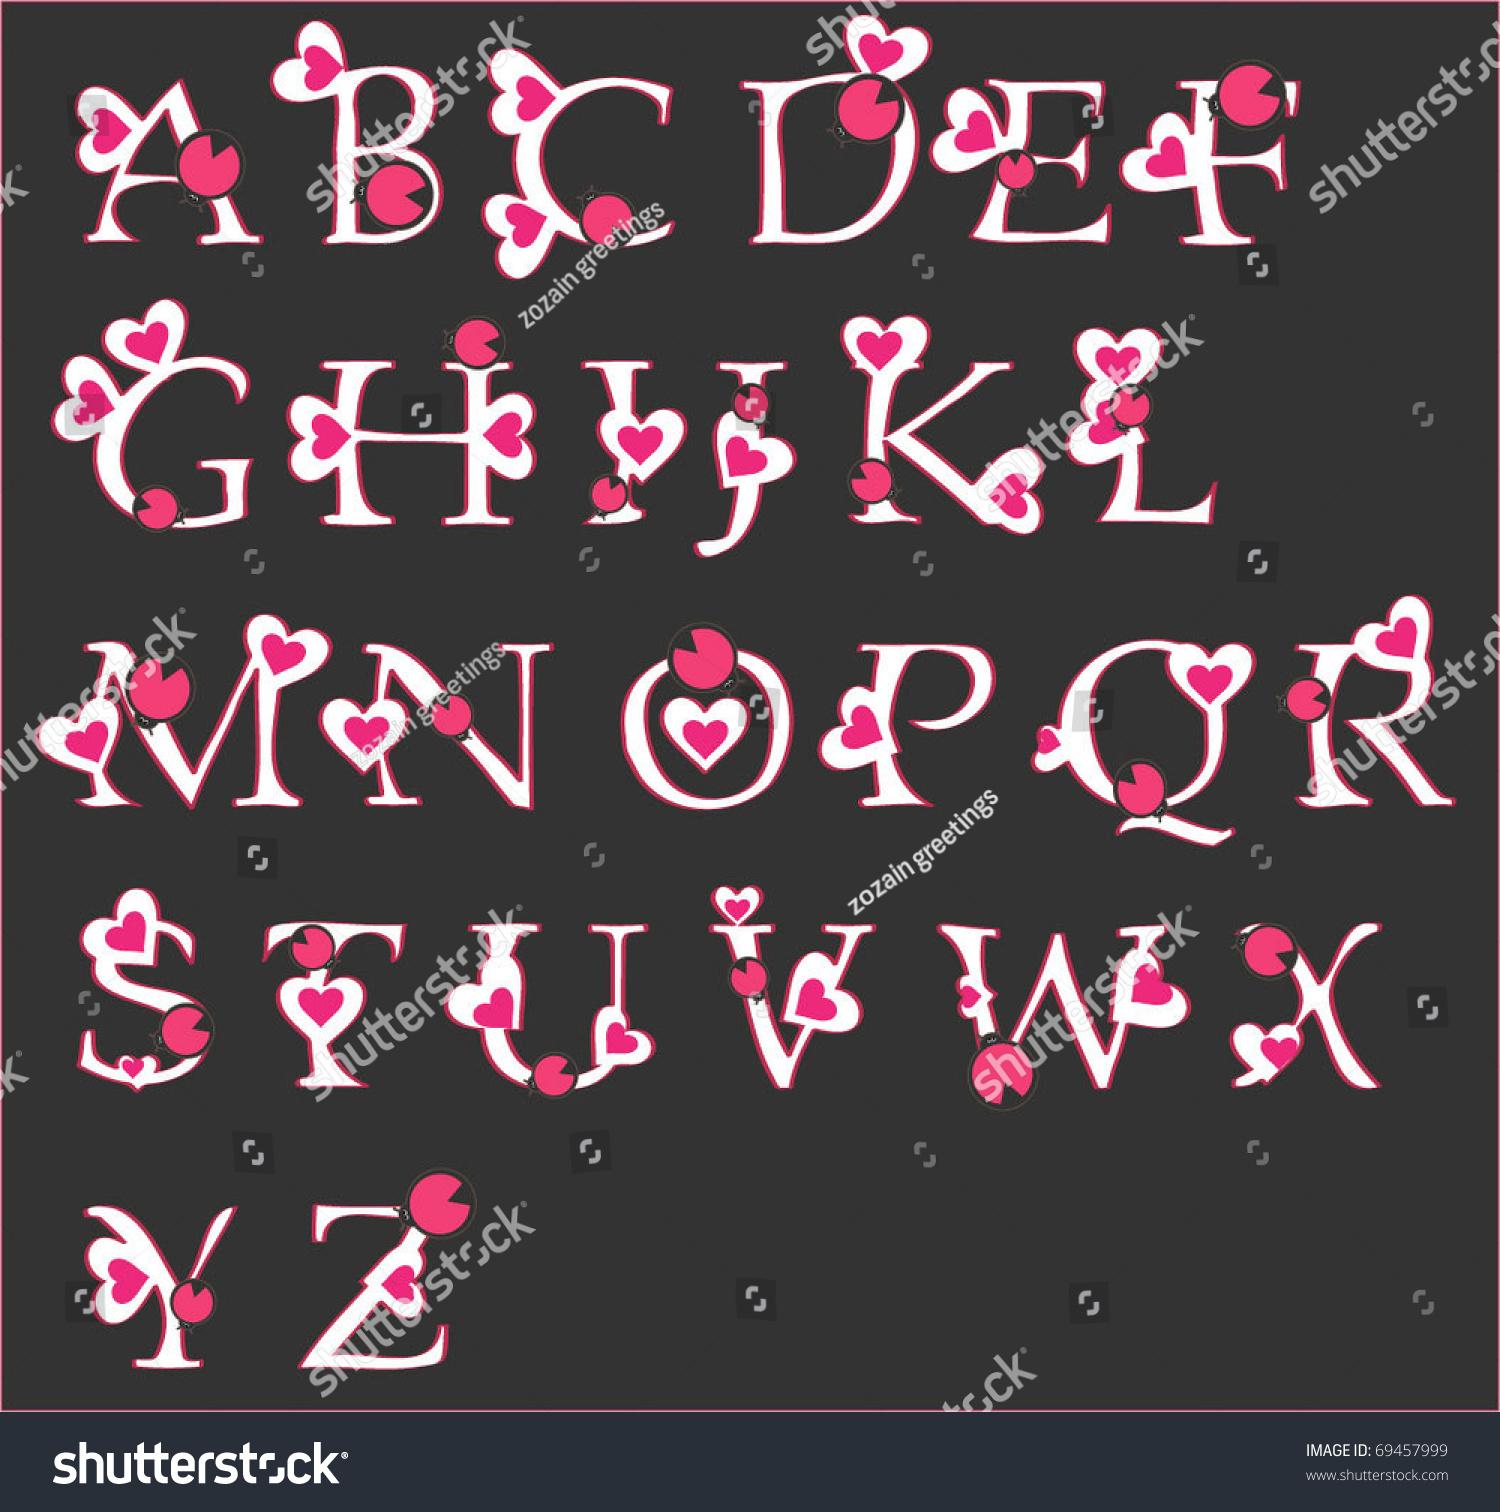 Decorative Letters Decorative Letters Hearts Stock Vector 69457999 Shutterstock